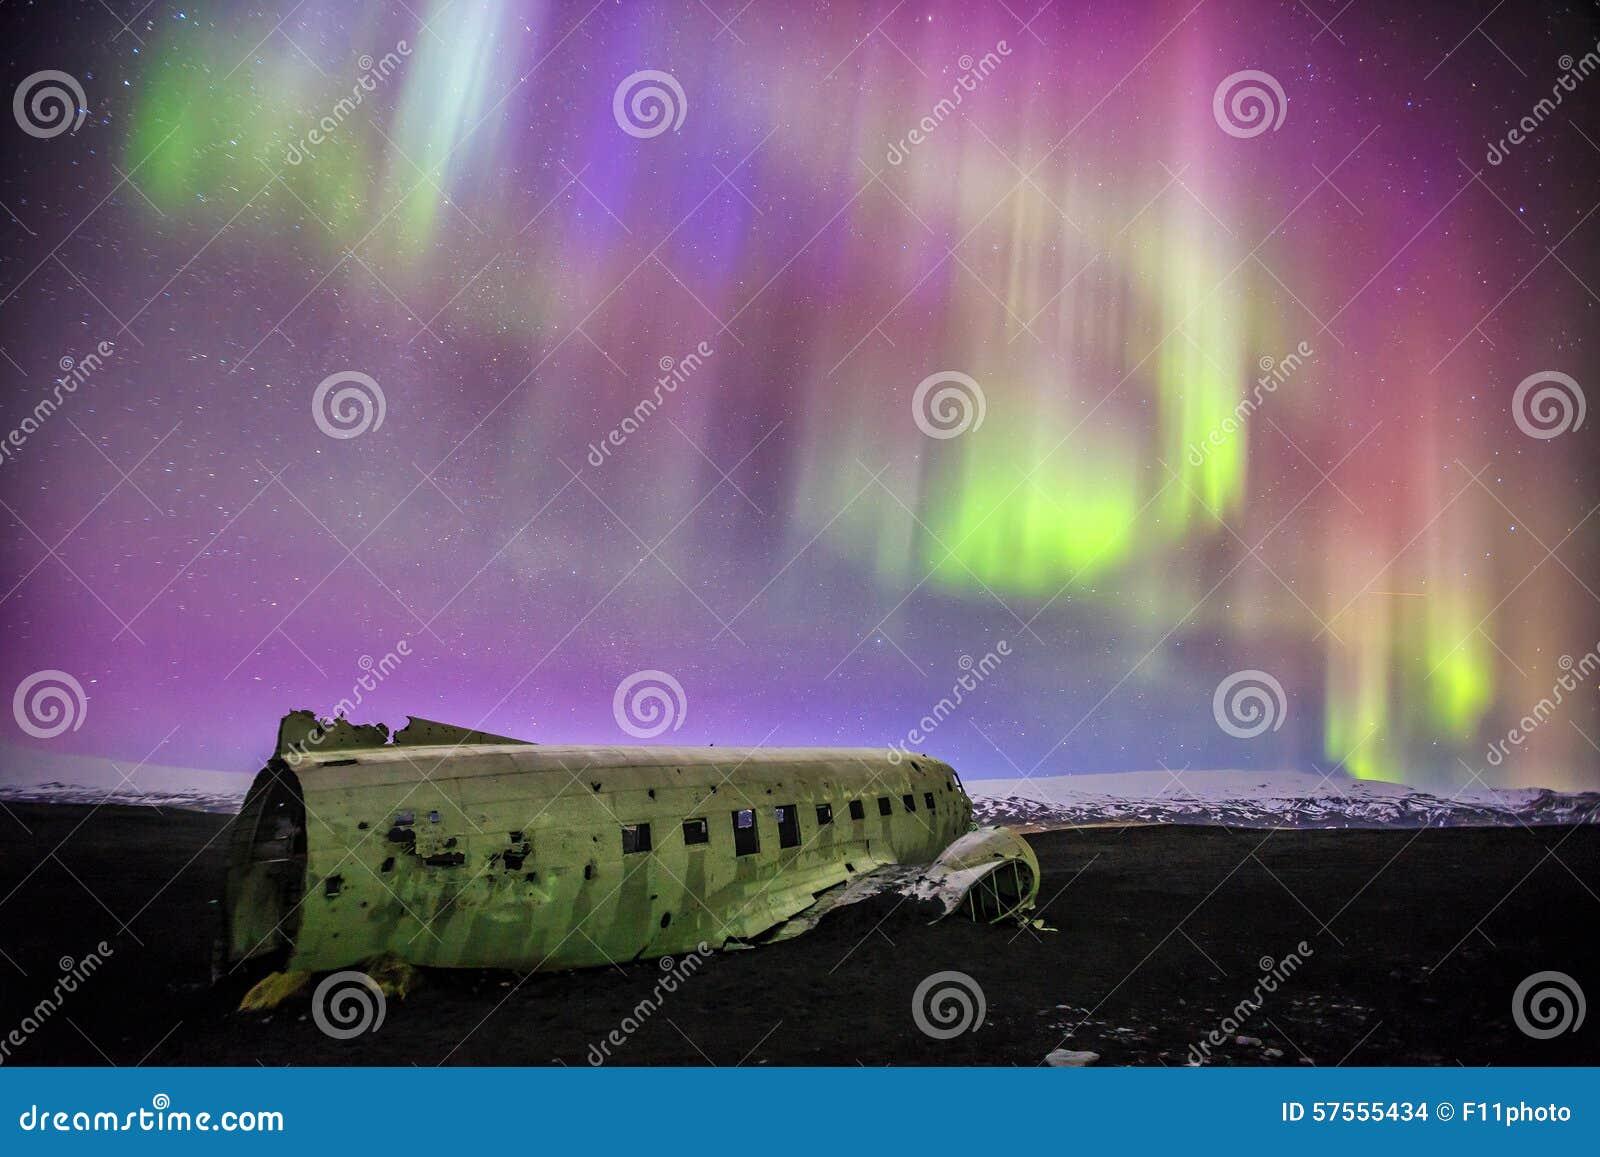 Northern lights over plane wreck in Vik, Iceland